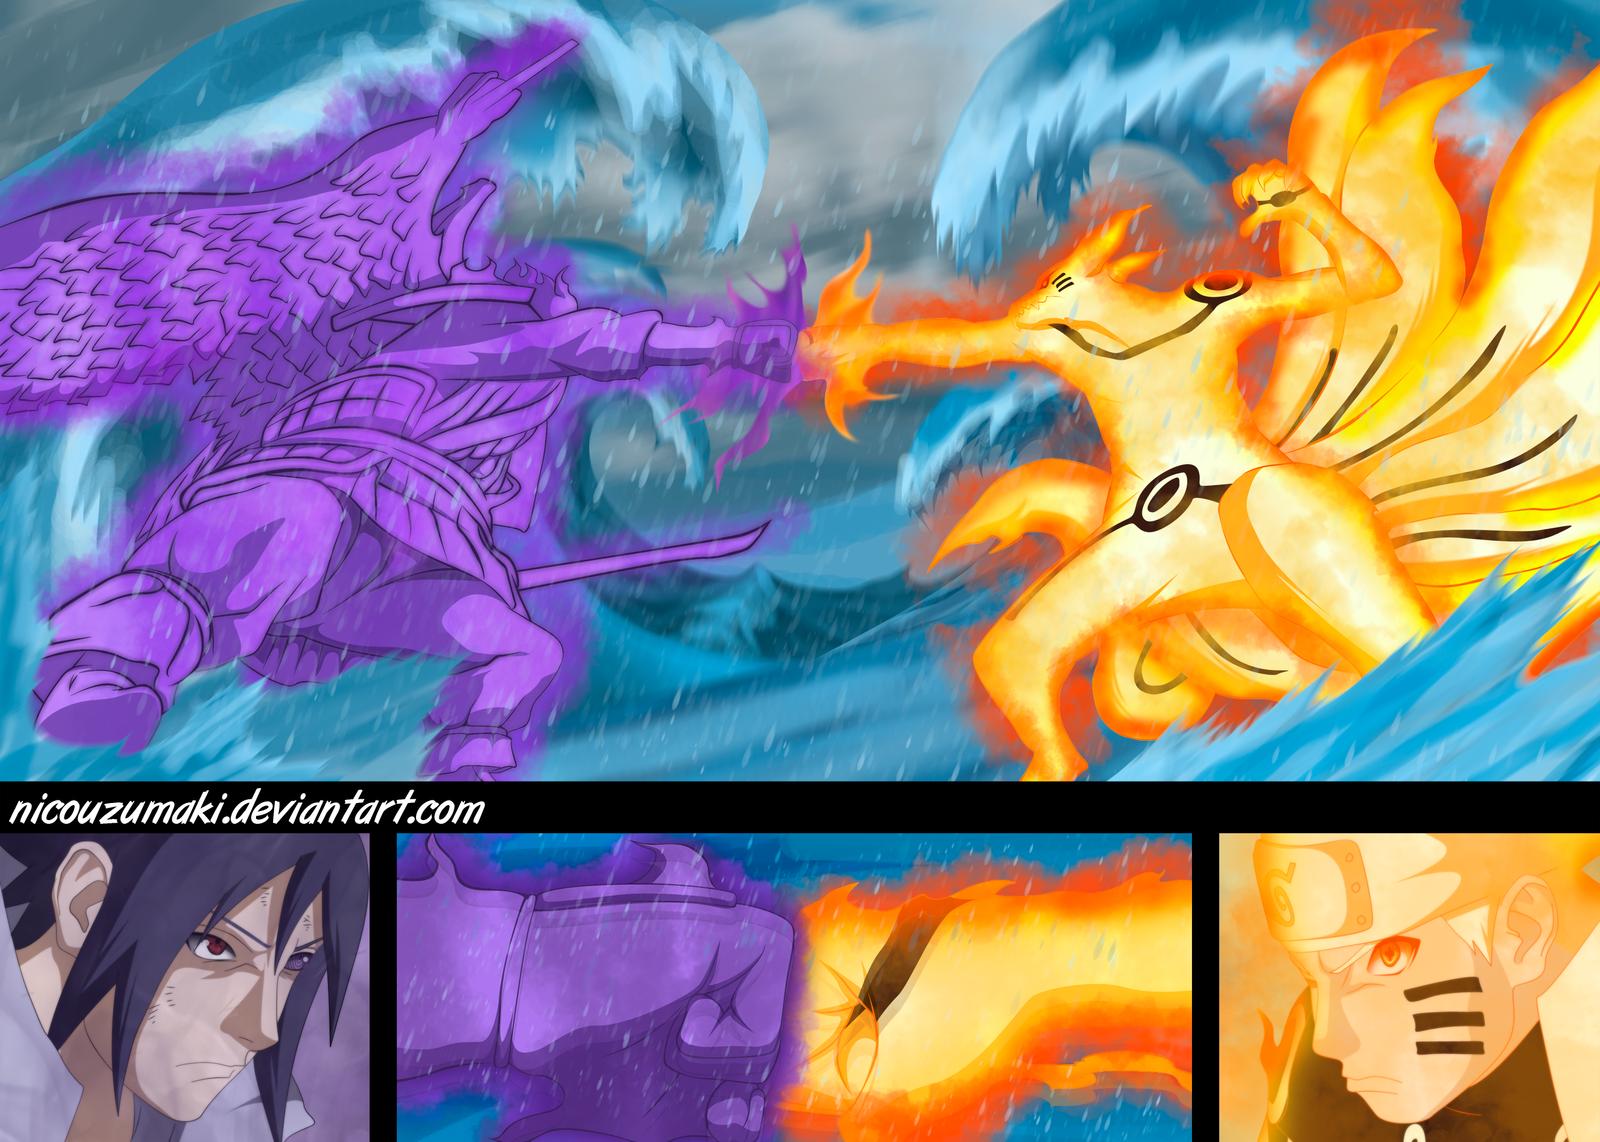 naruto vs sasuke la batalla final by nicouzumaki on DeviantArt